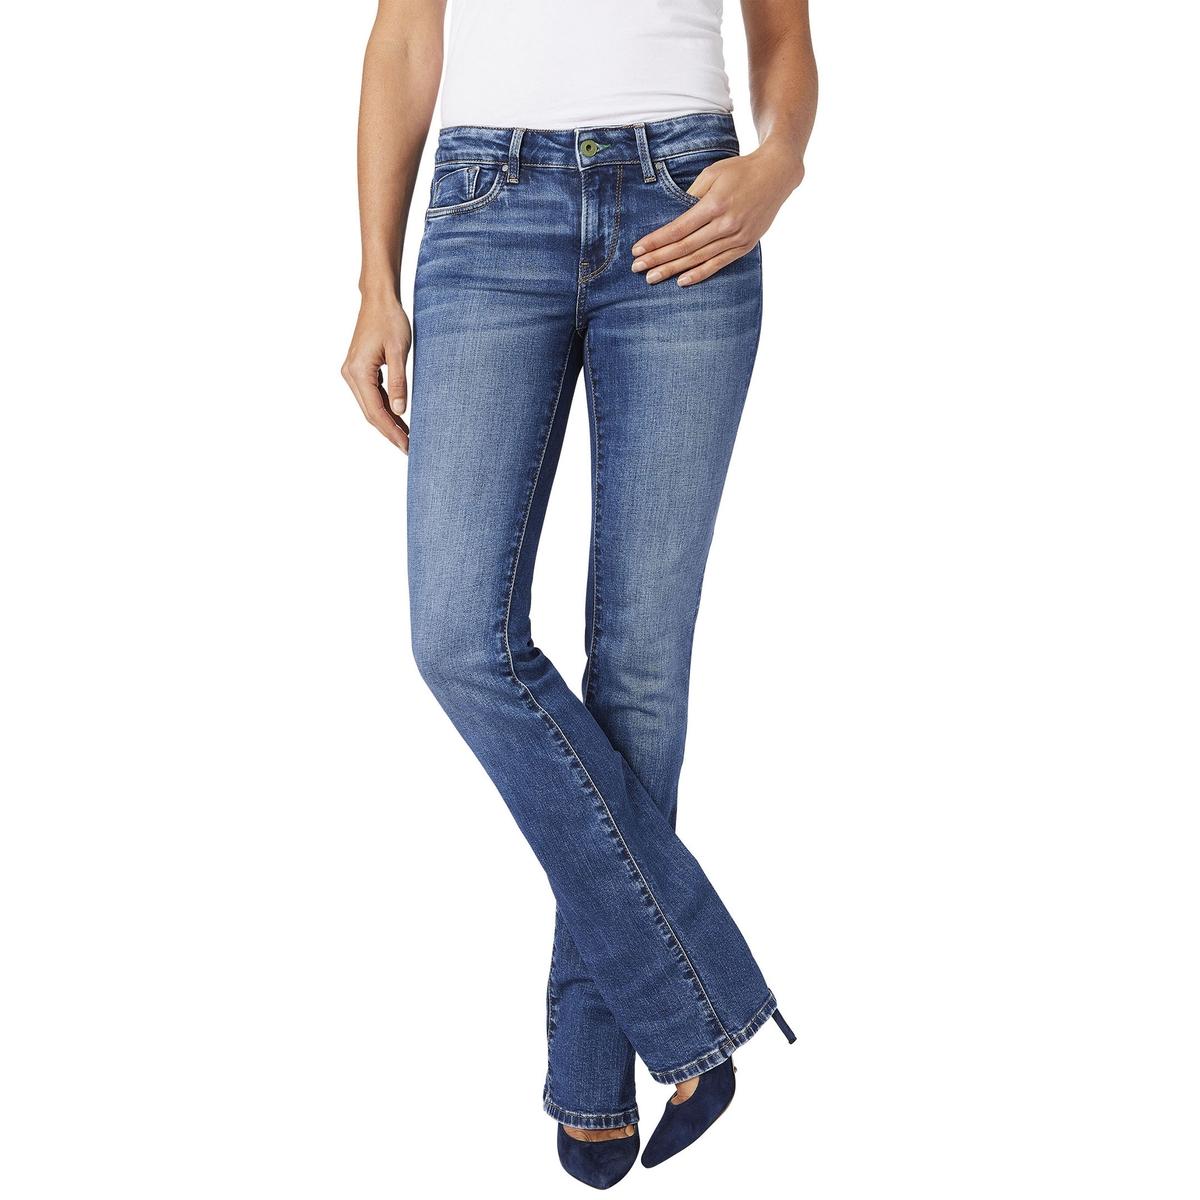 Imagen secundaria de producto de Vaqueros Bootcut PICADILLY - Pepe Jeans